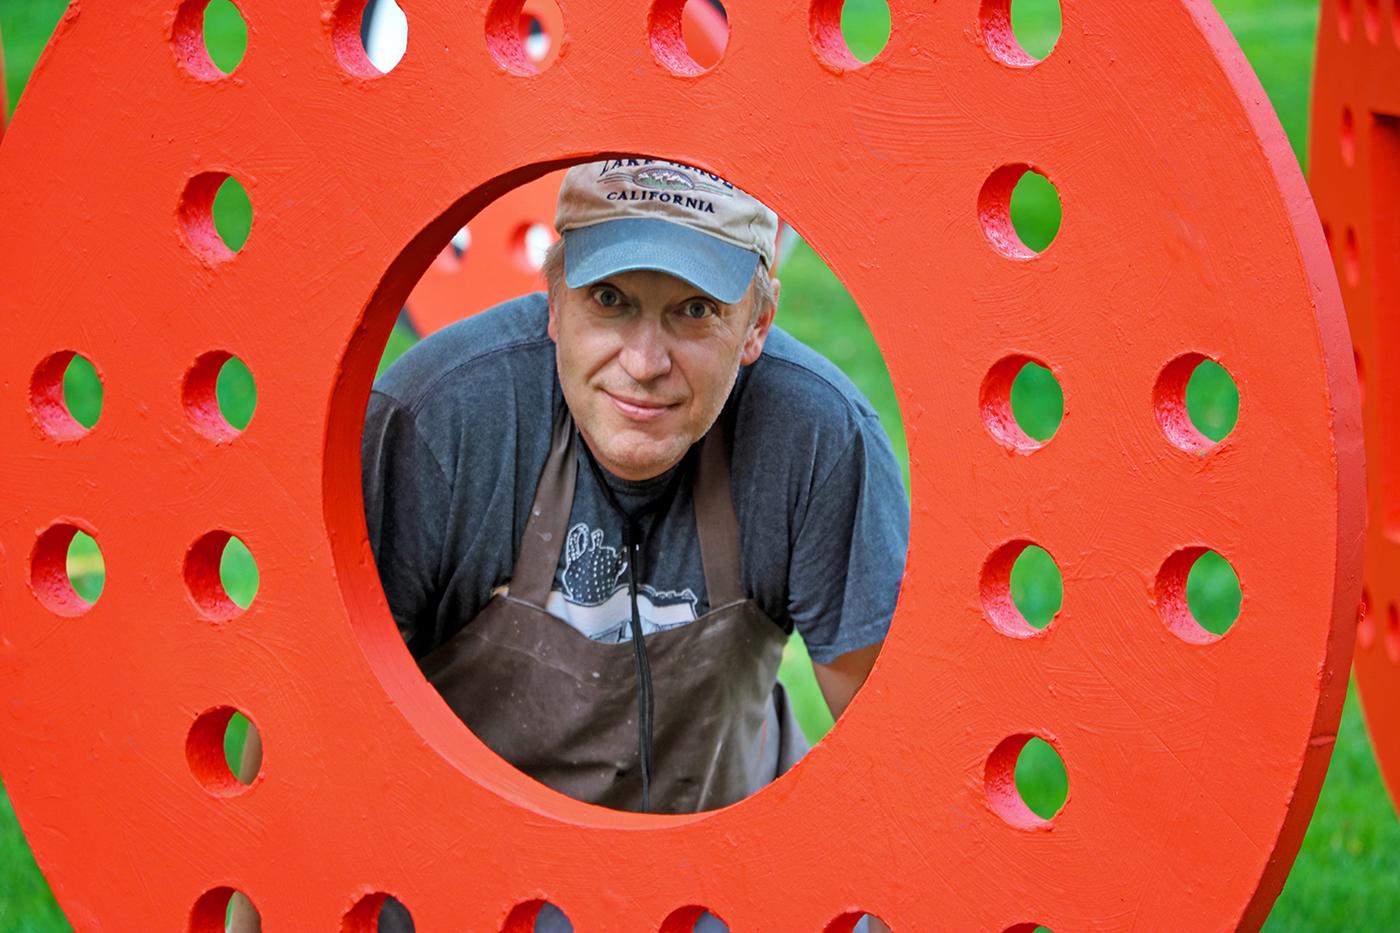 sculpture Outdoor Sculpture abstract sculpture polystyrene Governors Island Art installation New York public art